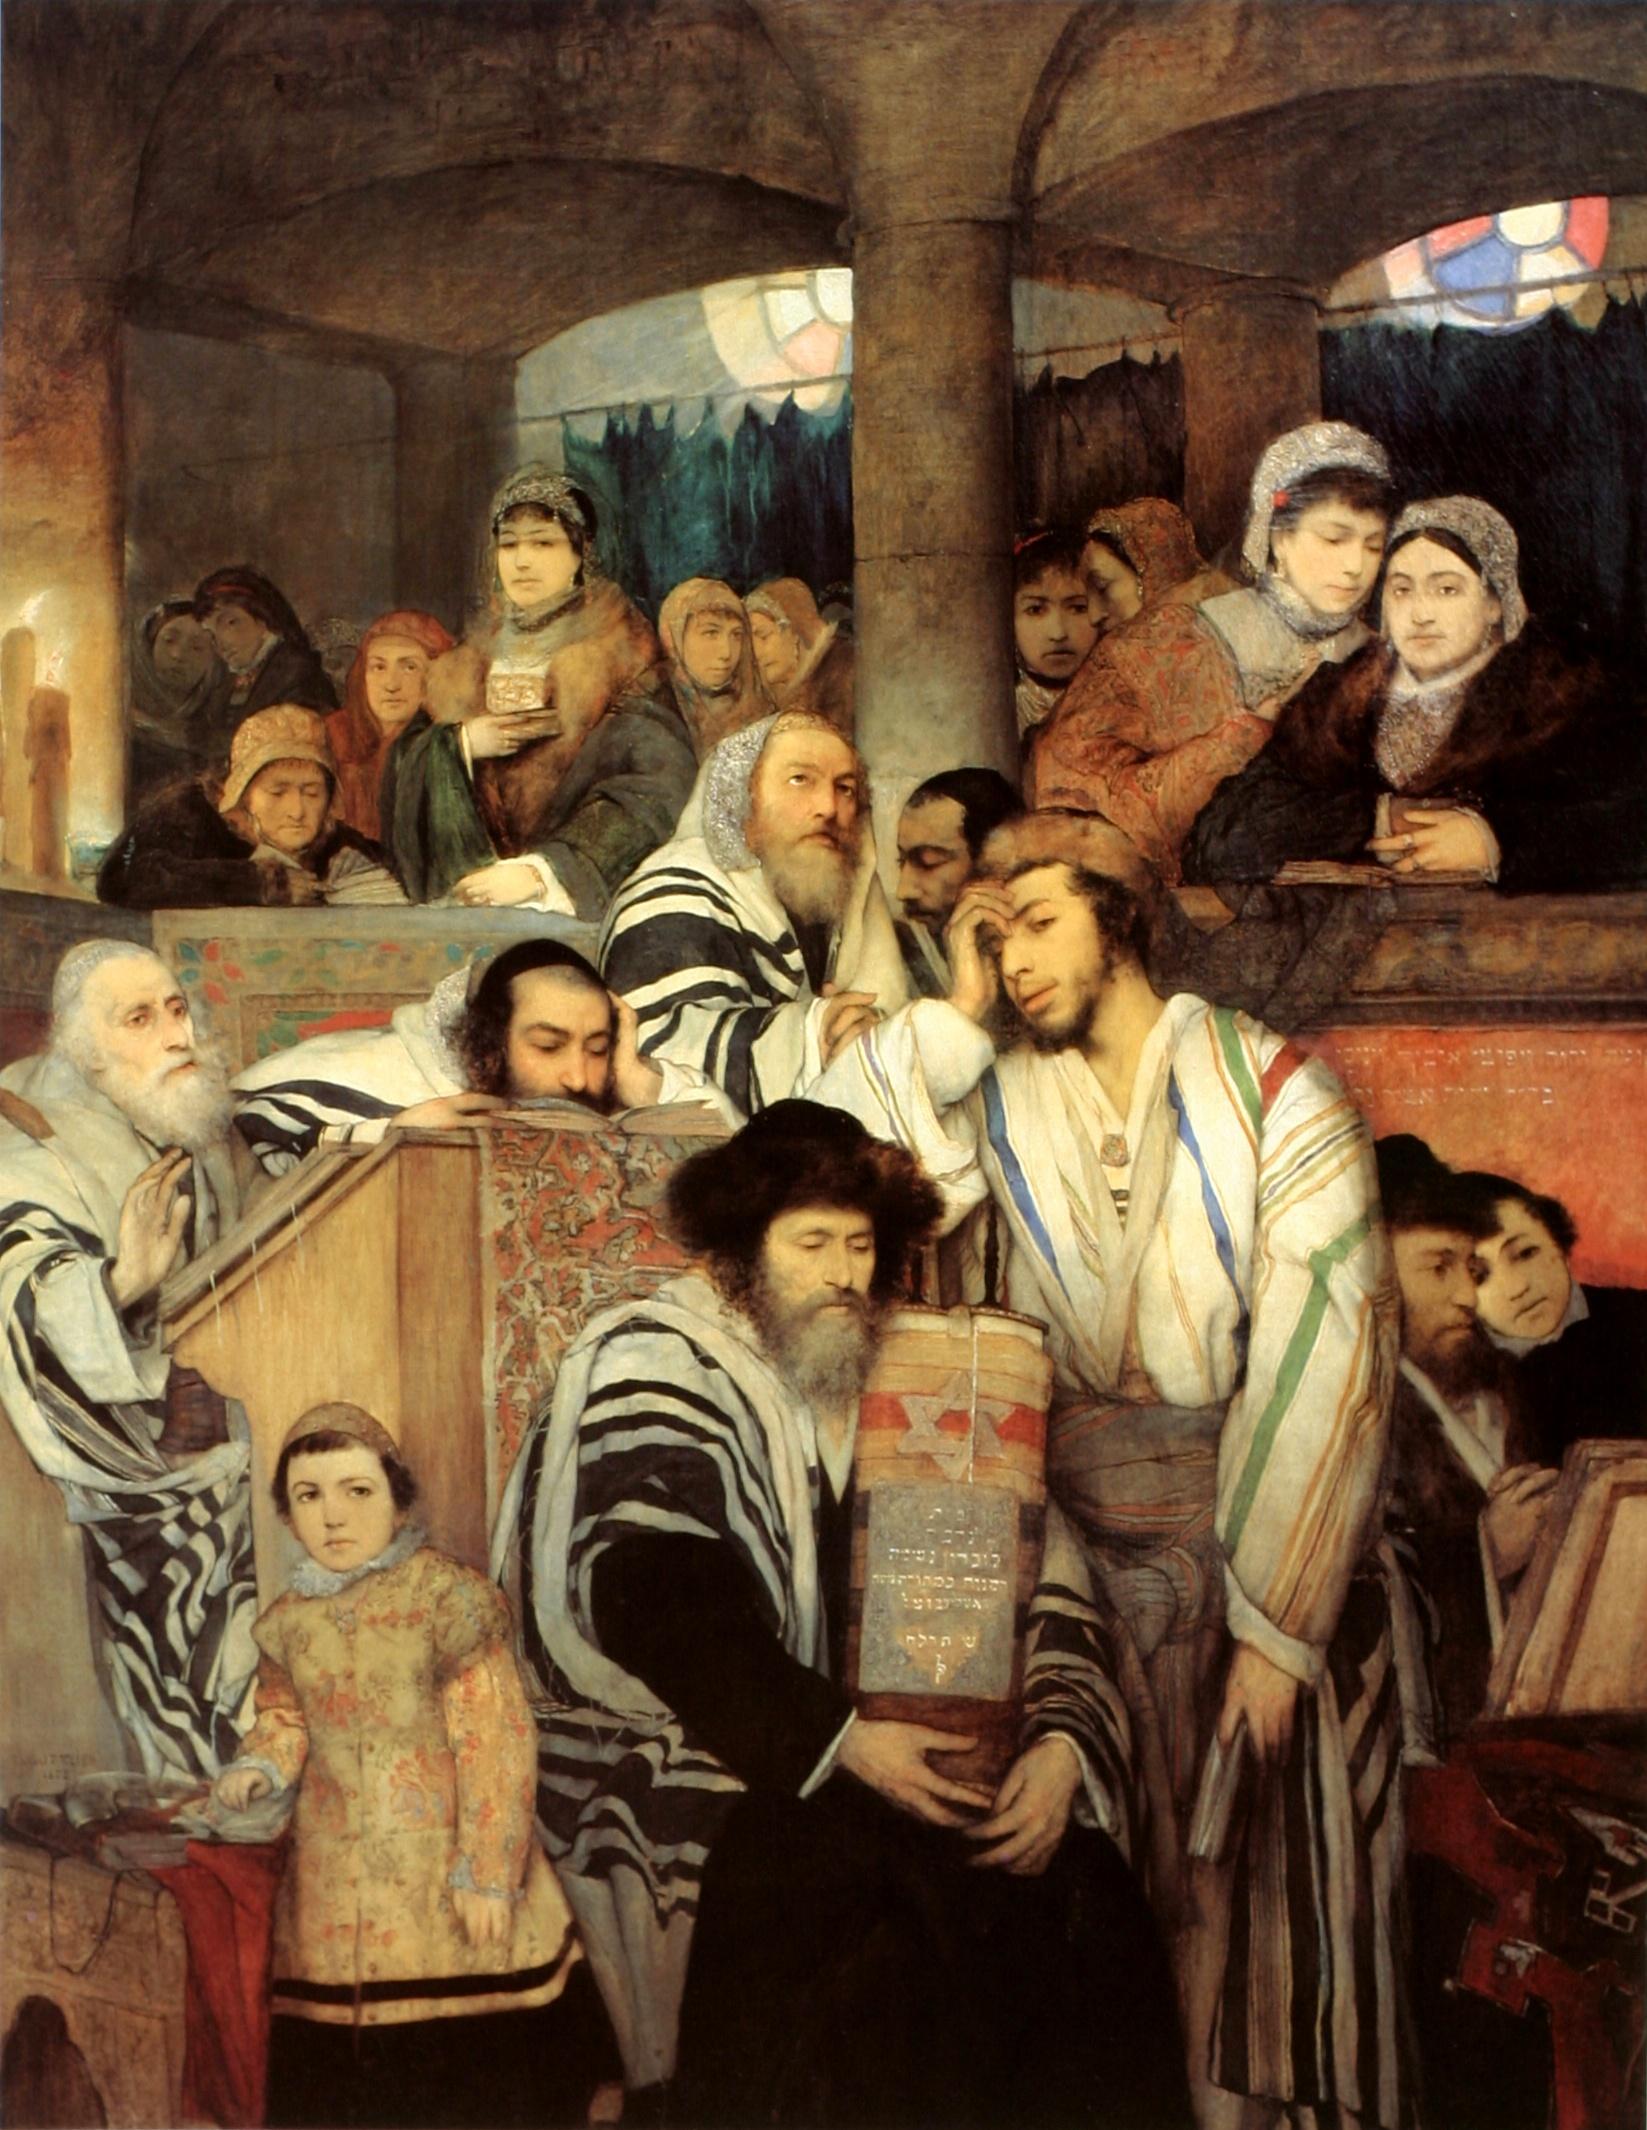 Maurycy_Gottlieb_-_Jews_Praying_in_the_Synagogue_on_Yom_Kippur.jpg